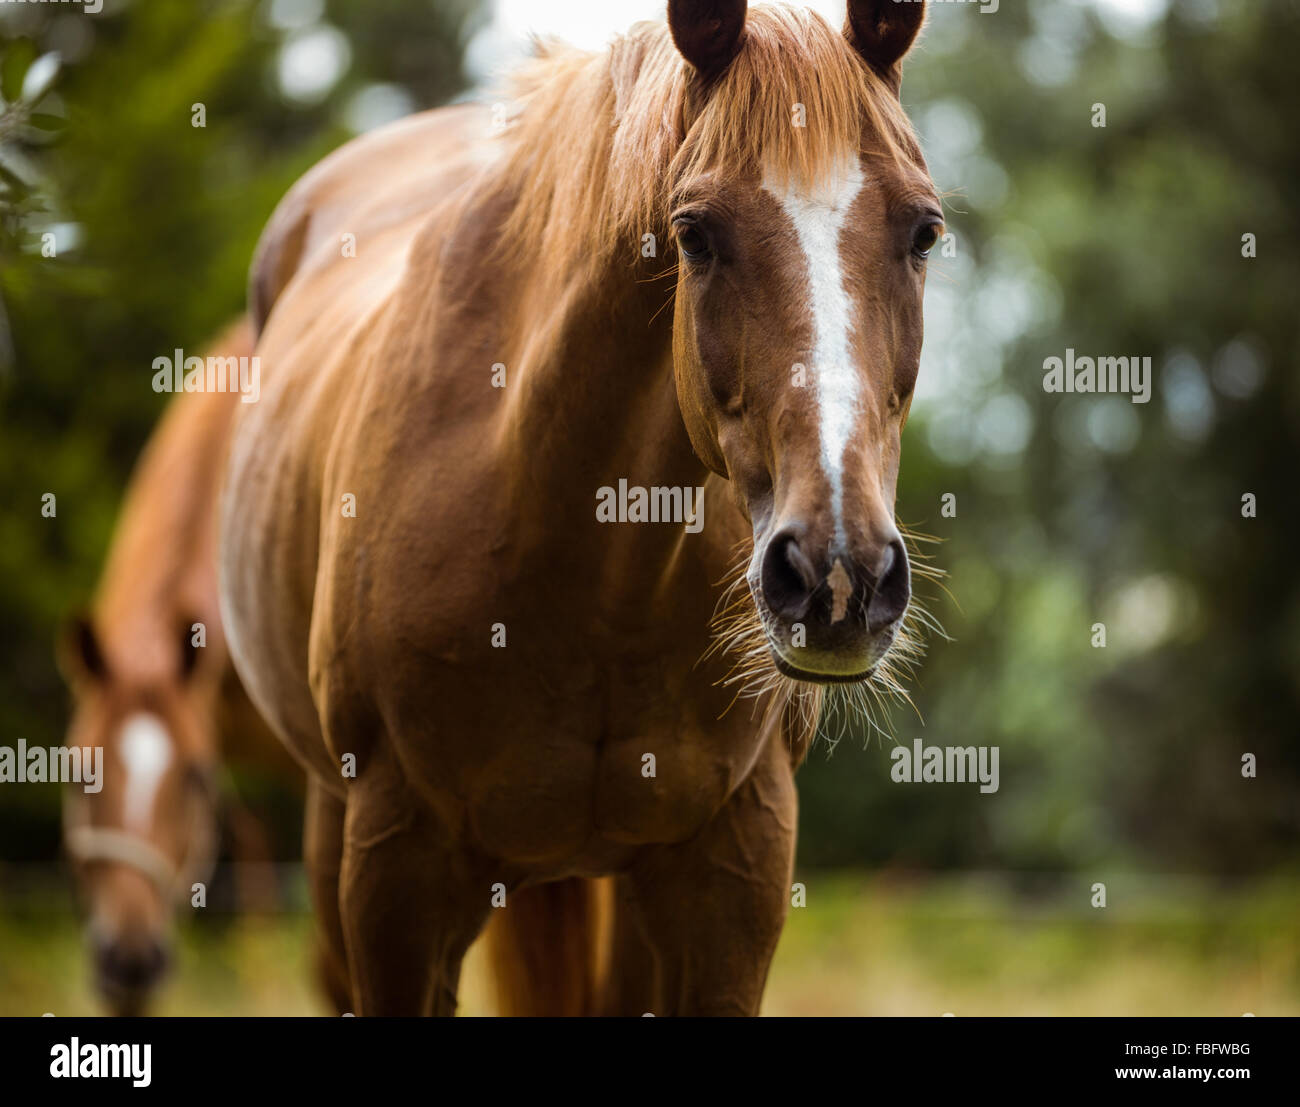 Thorough bred horse looking at camera - Stock Image